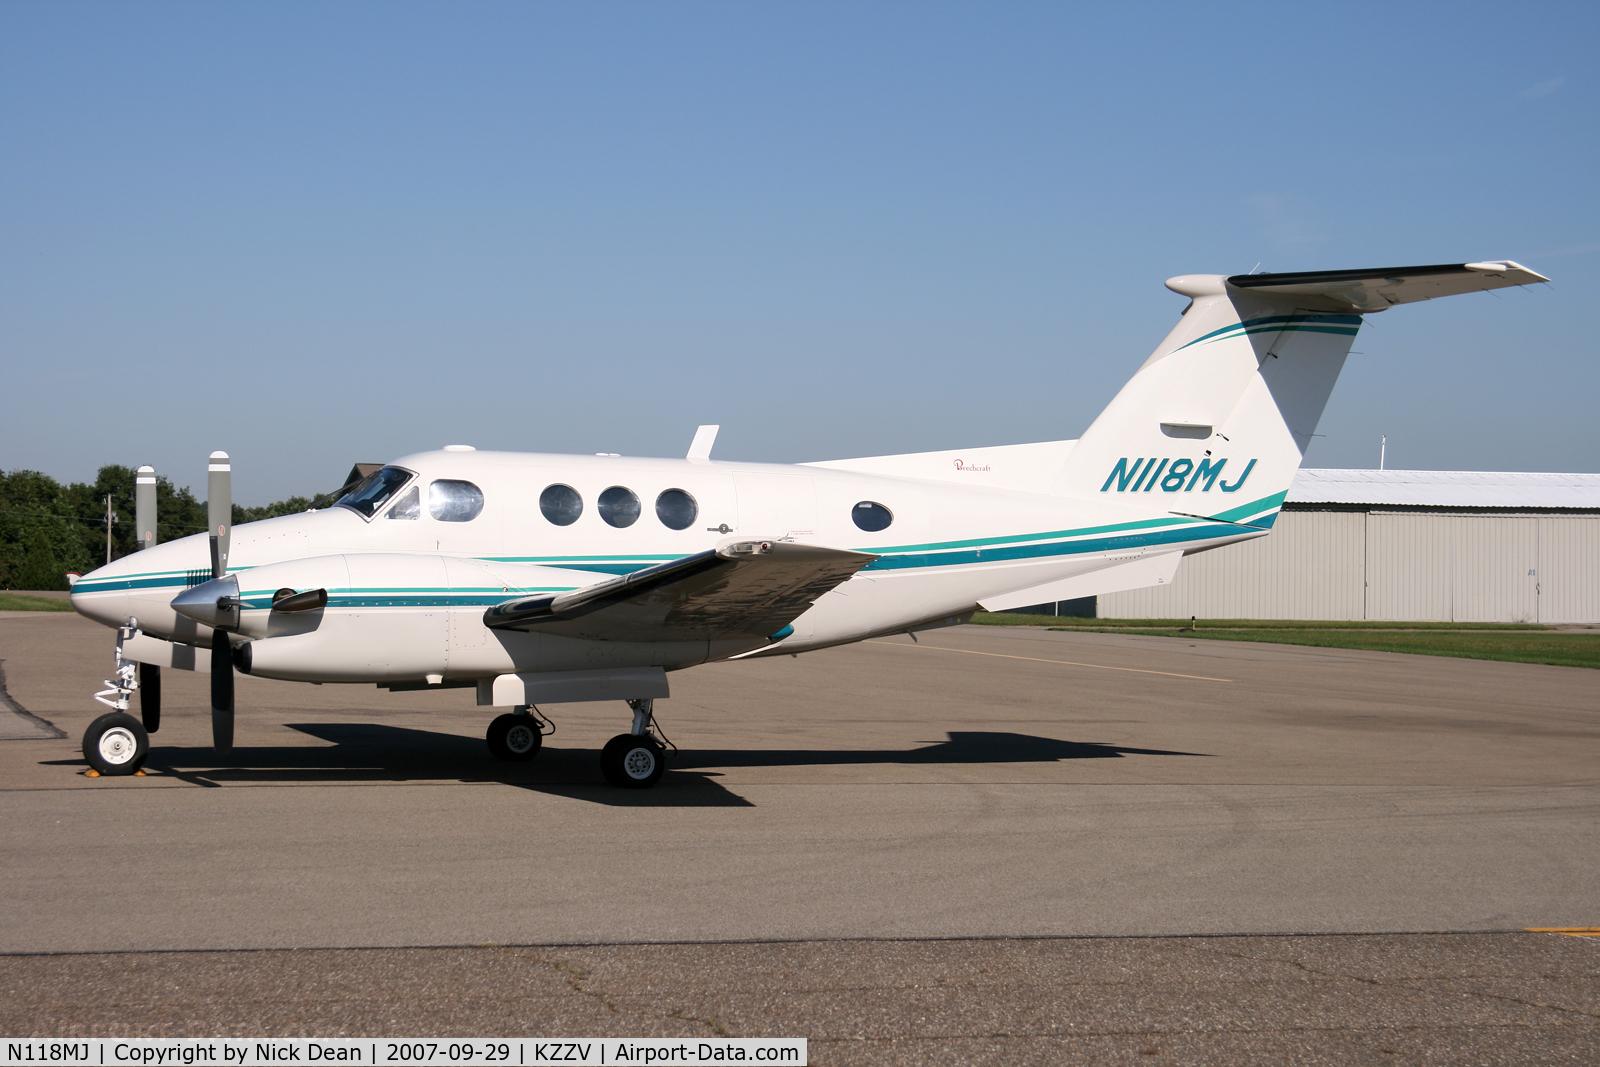 N118MJ, 1982 Beech F90 King Air C/N LA-199, KZZV